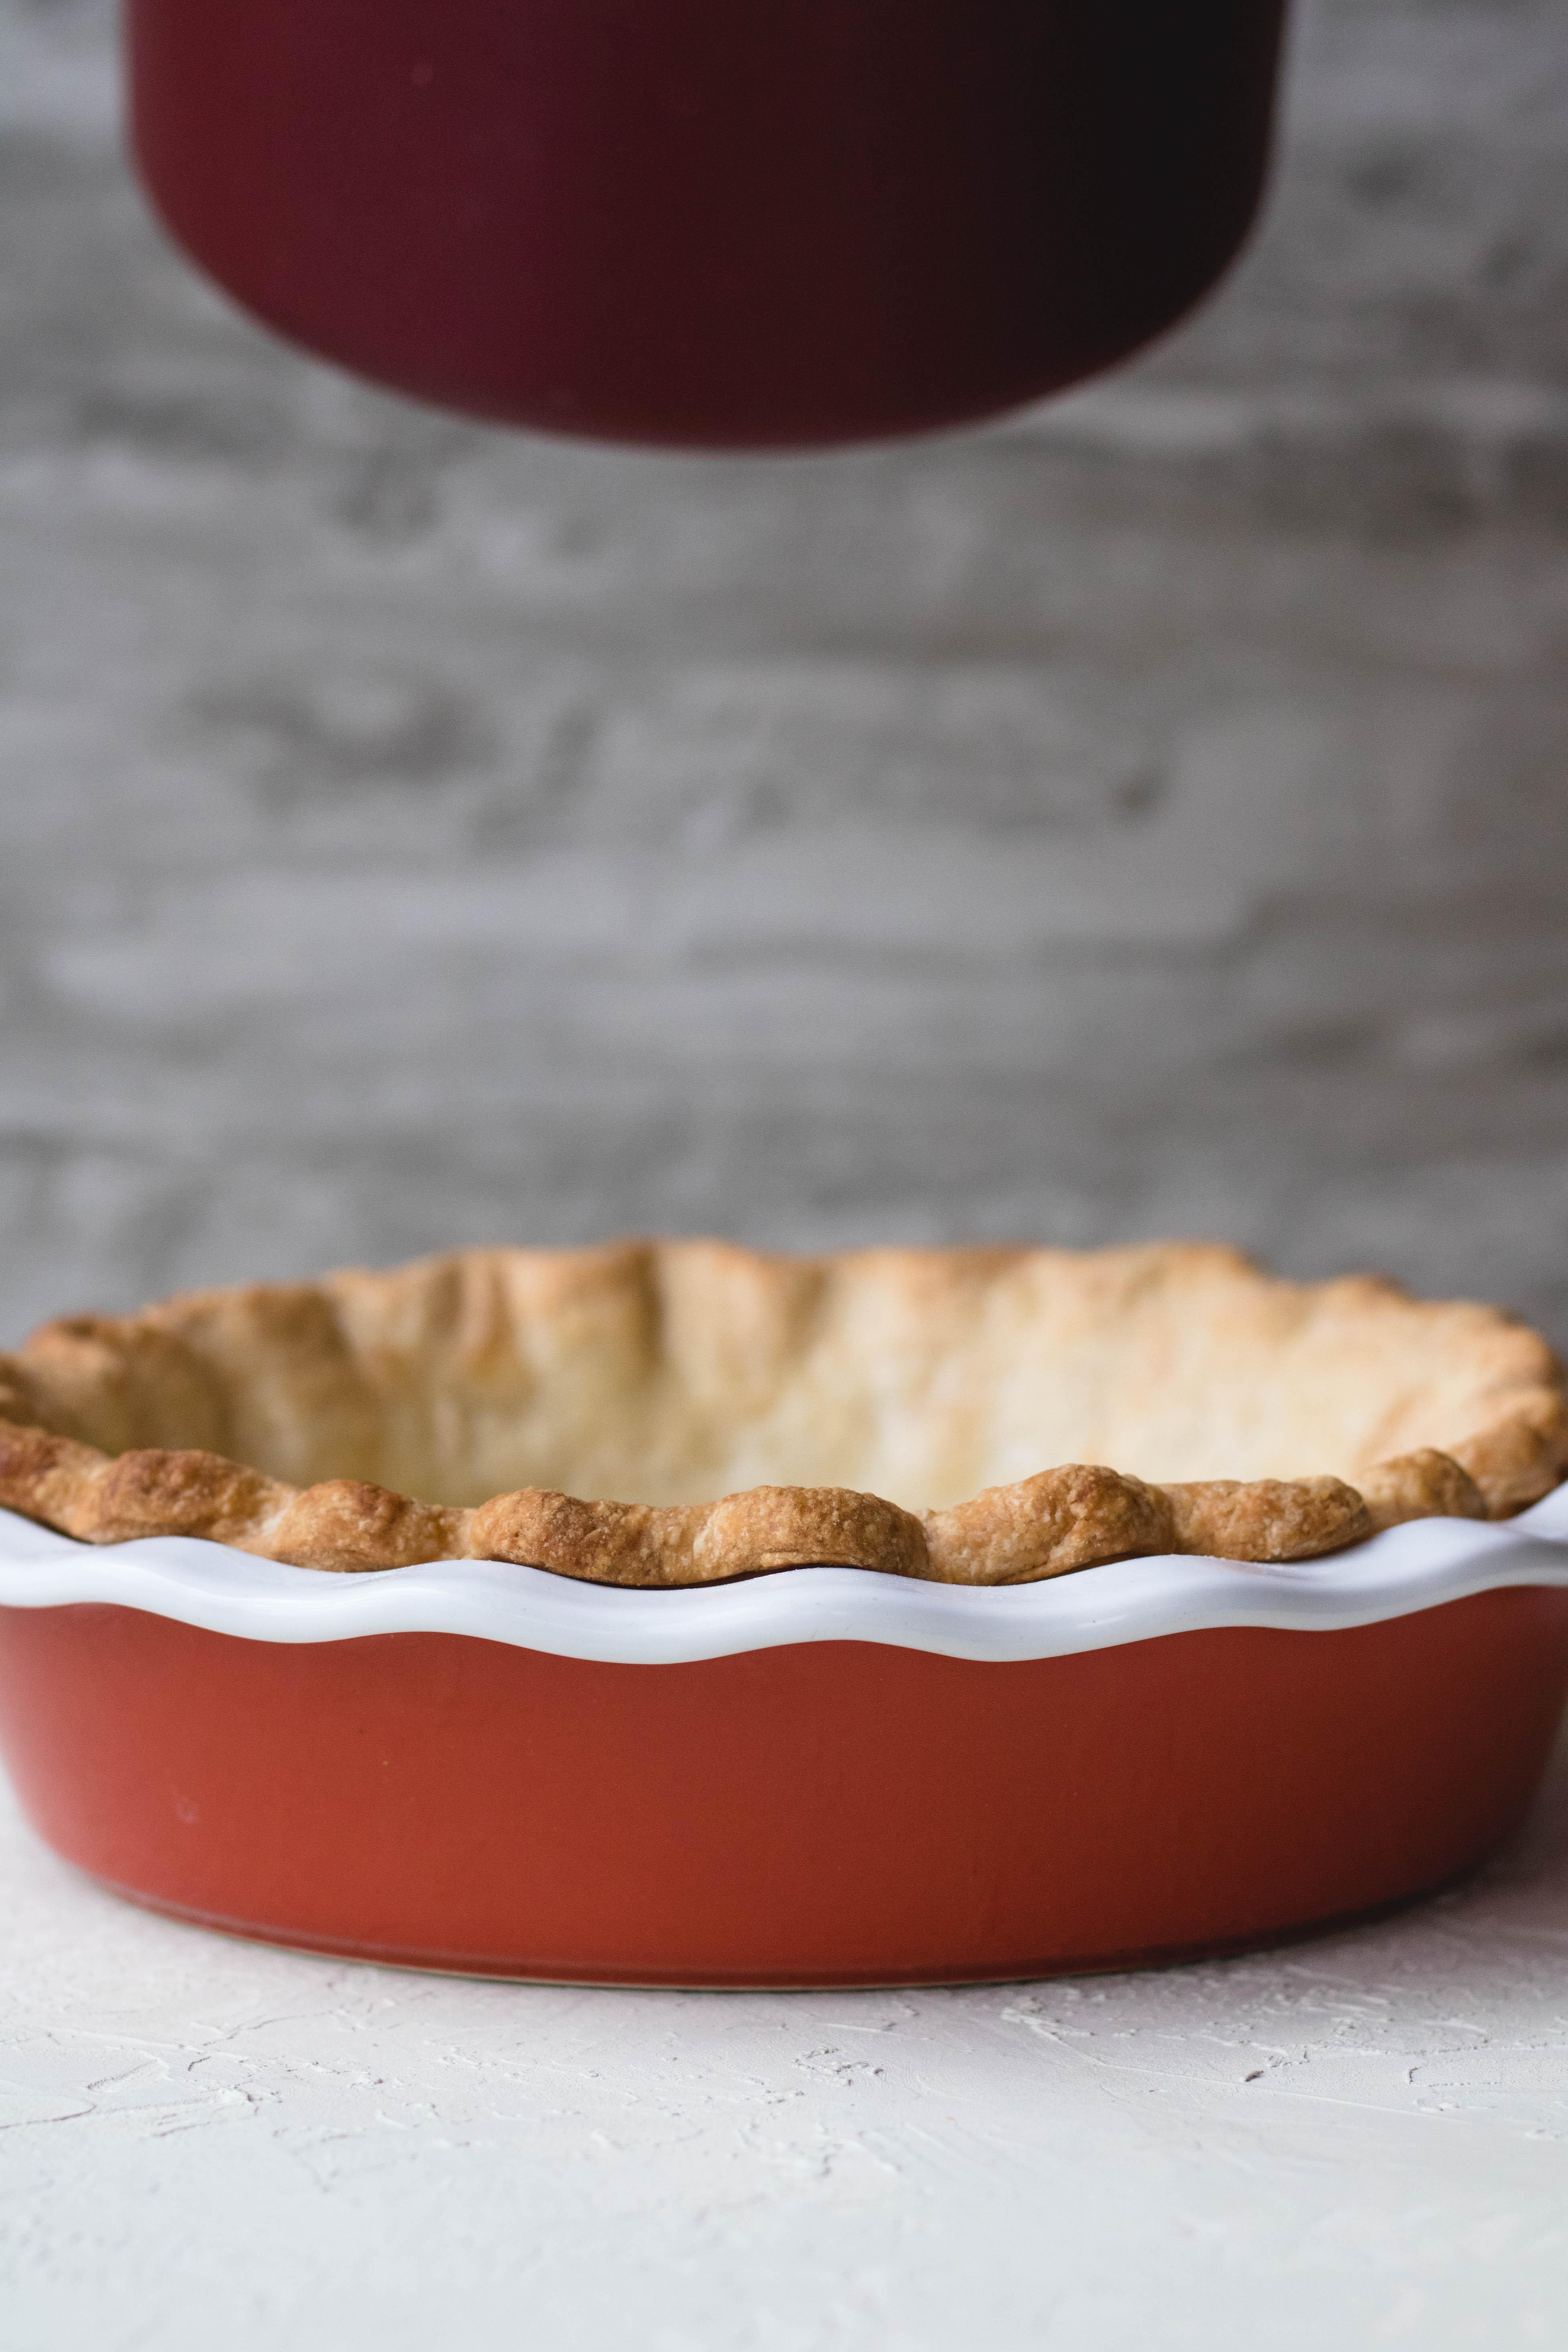 Golden brown pie crust for homemade buttery pie crust recipe